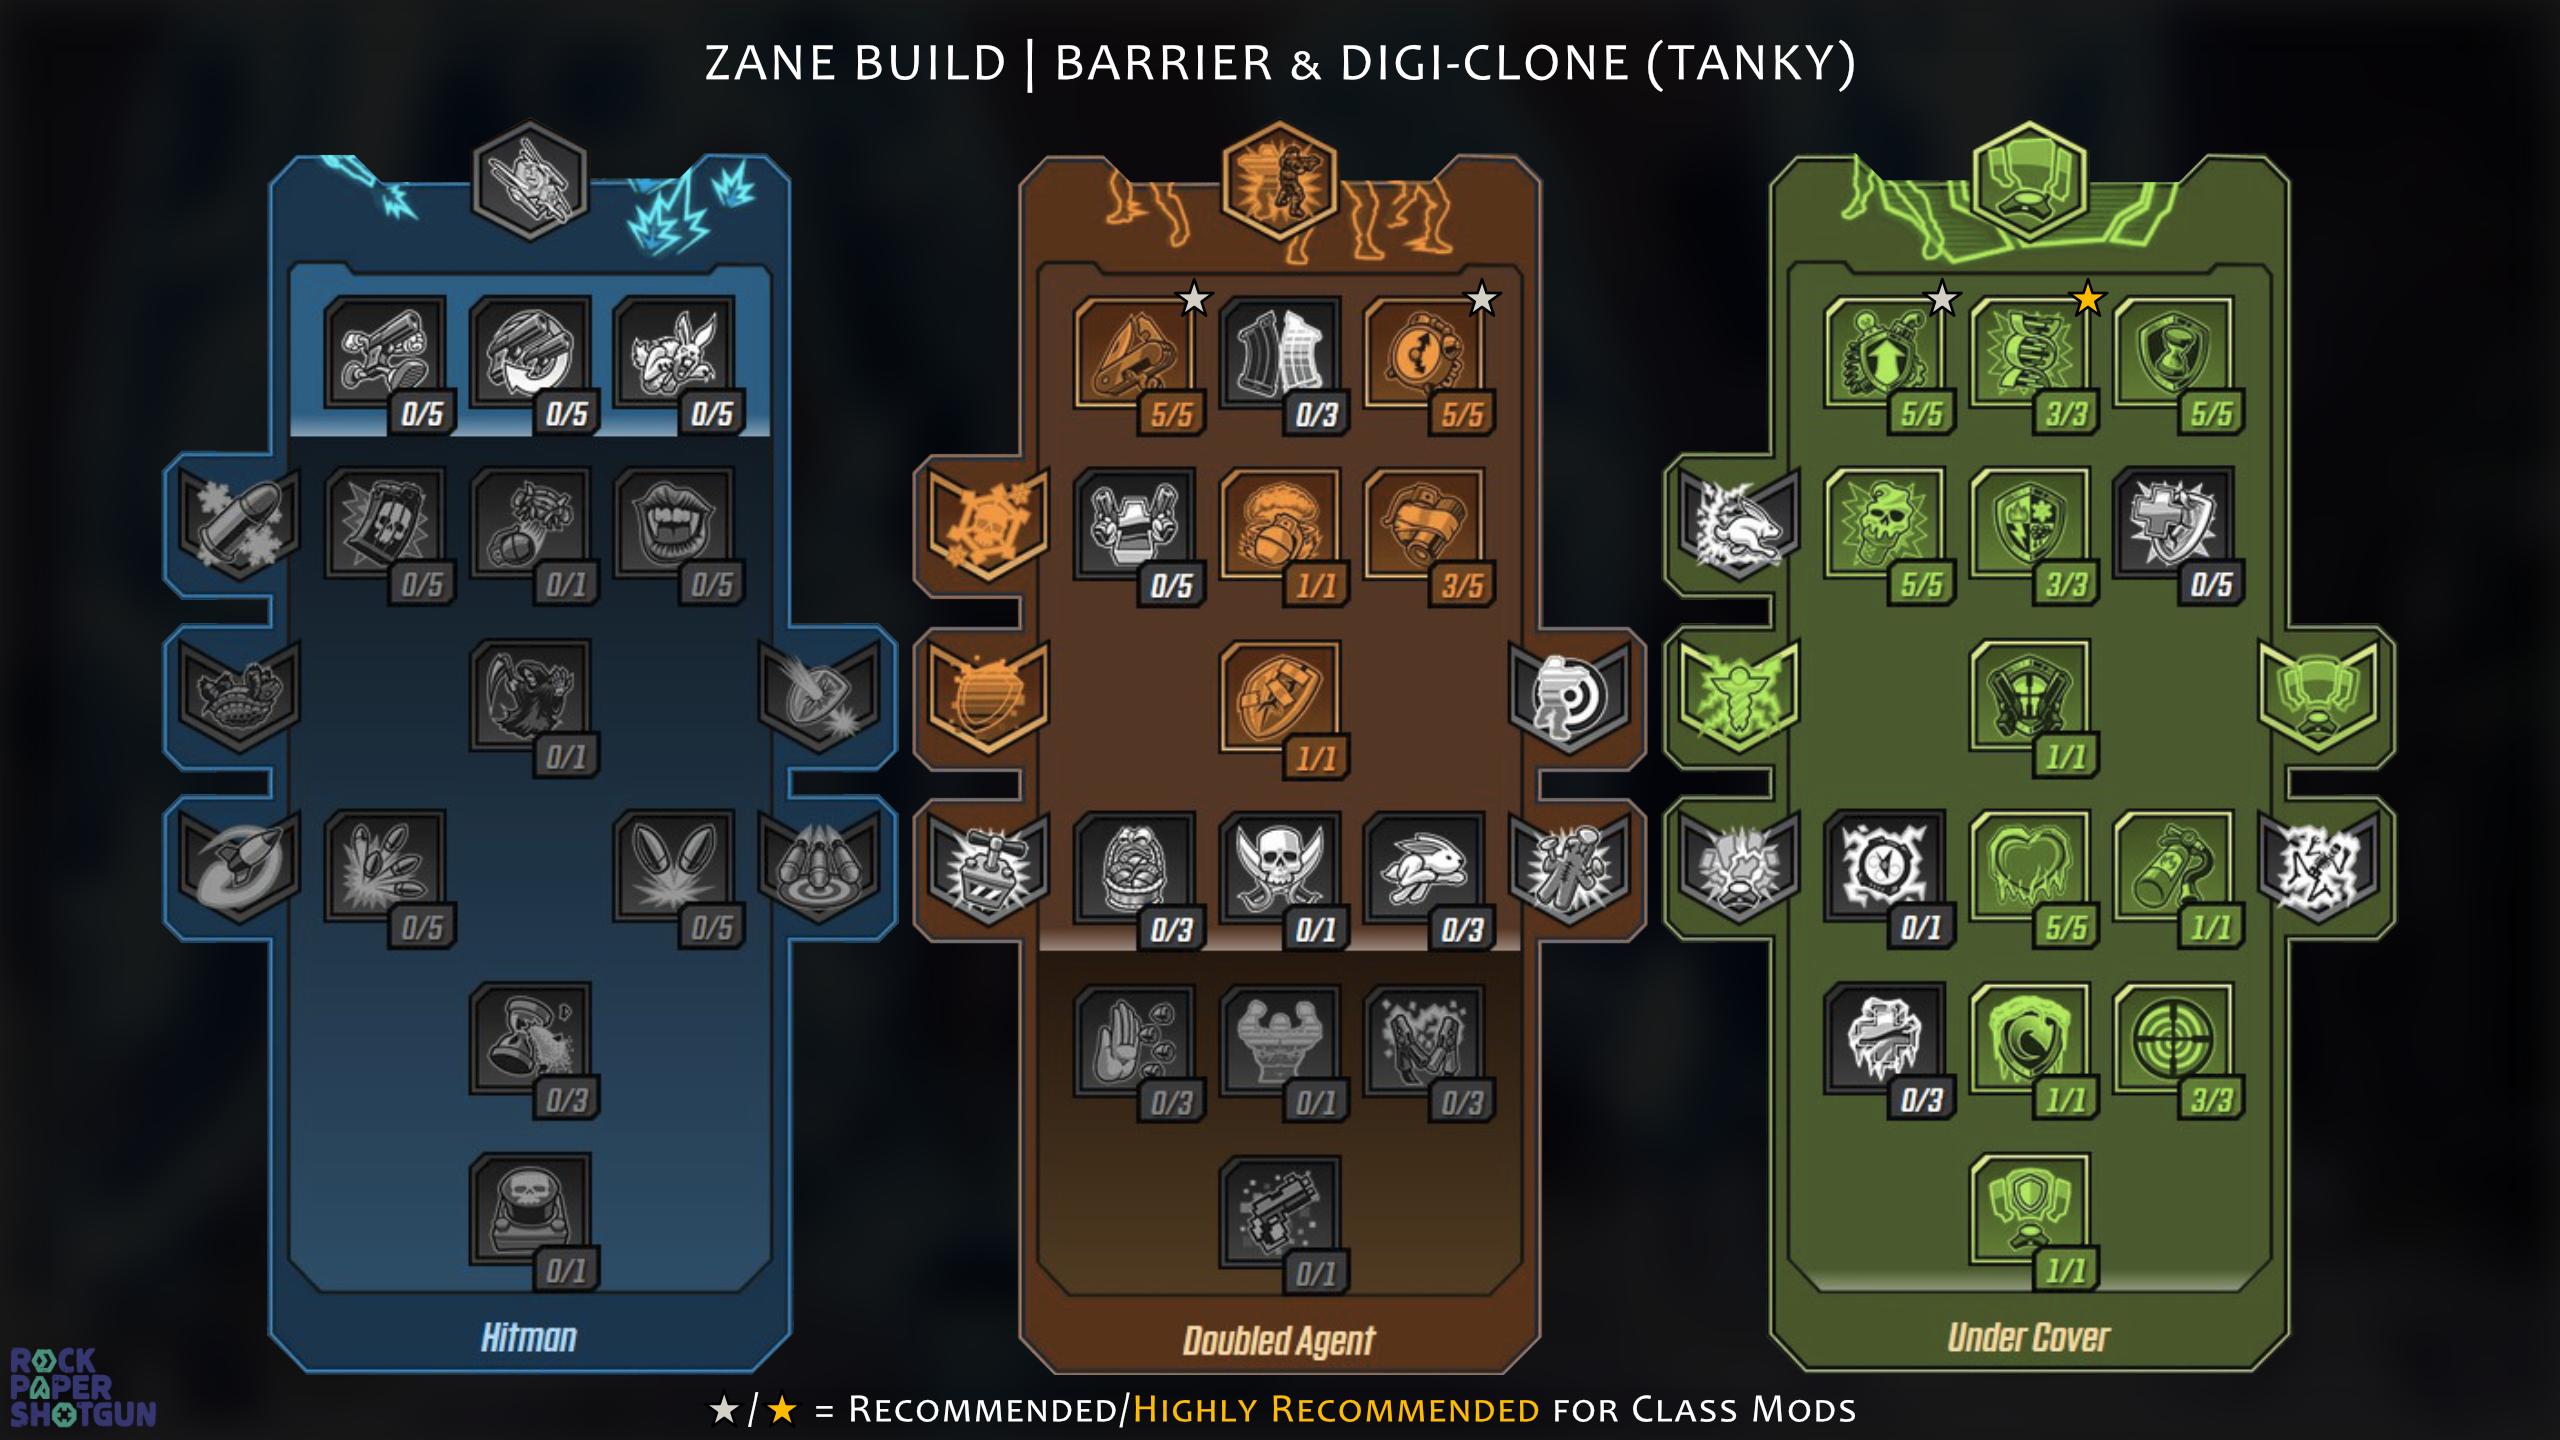 Borderlands 3 Zane build - Barrier & Digi-Clone